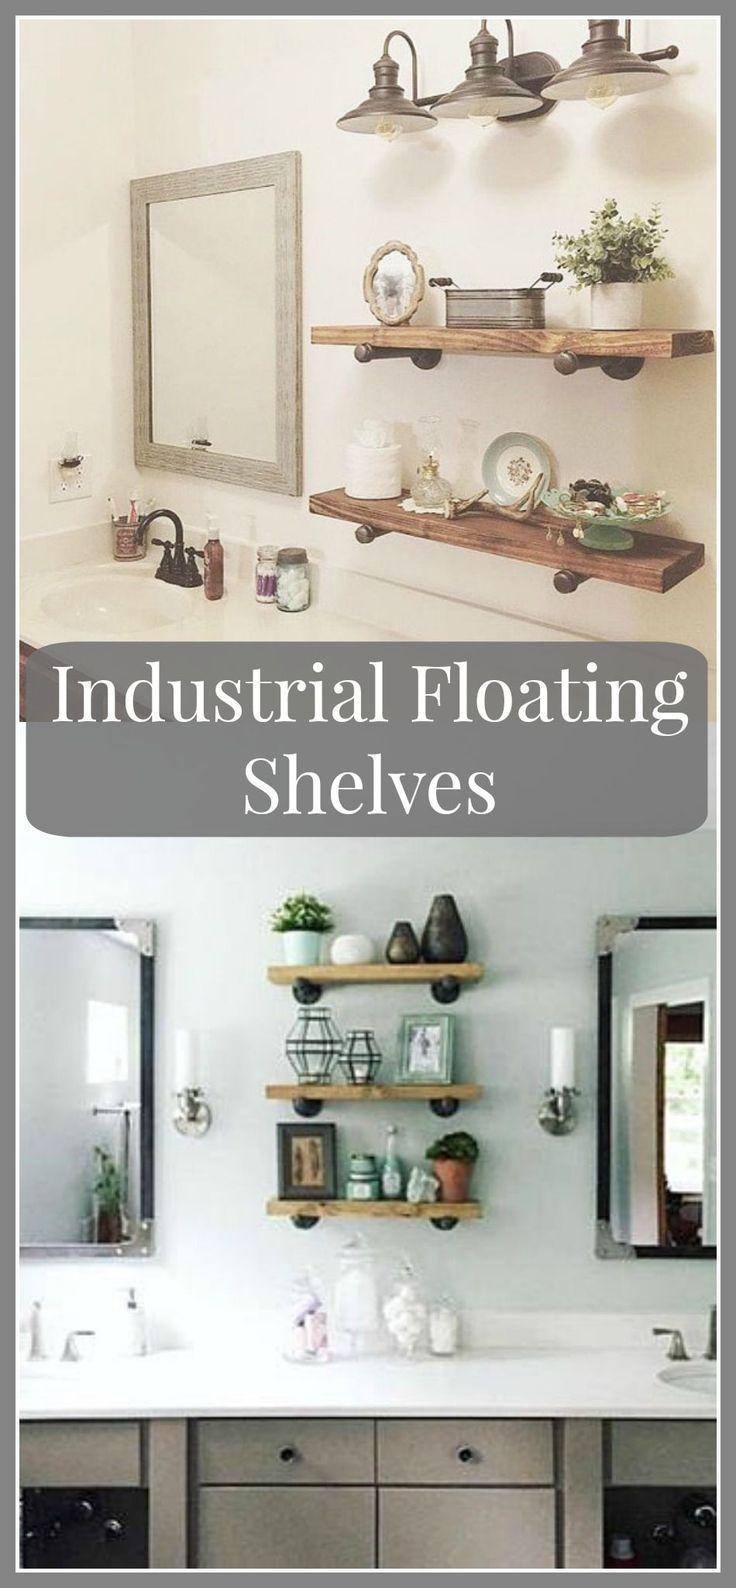 Industrial Floating Shelves, Set of 3 Bathroom Shelves, 8″ Depth Pipe Shelves, B…   – most beautiful shelves